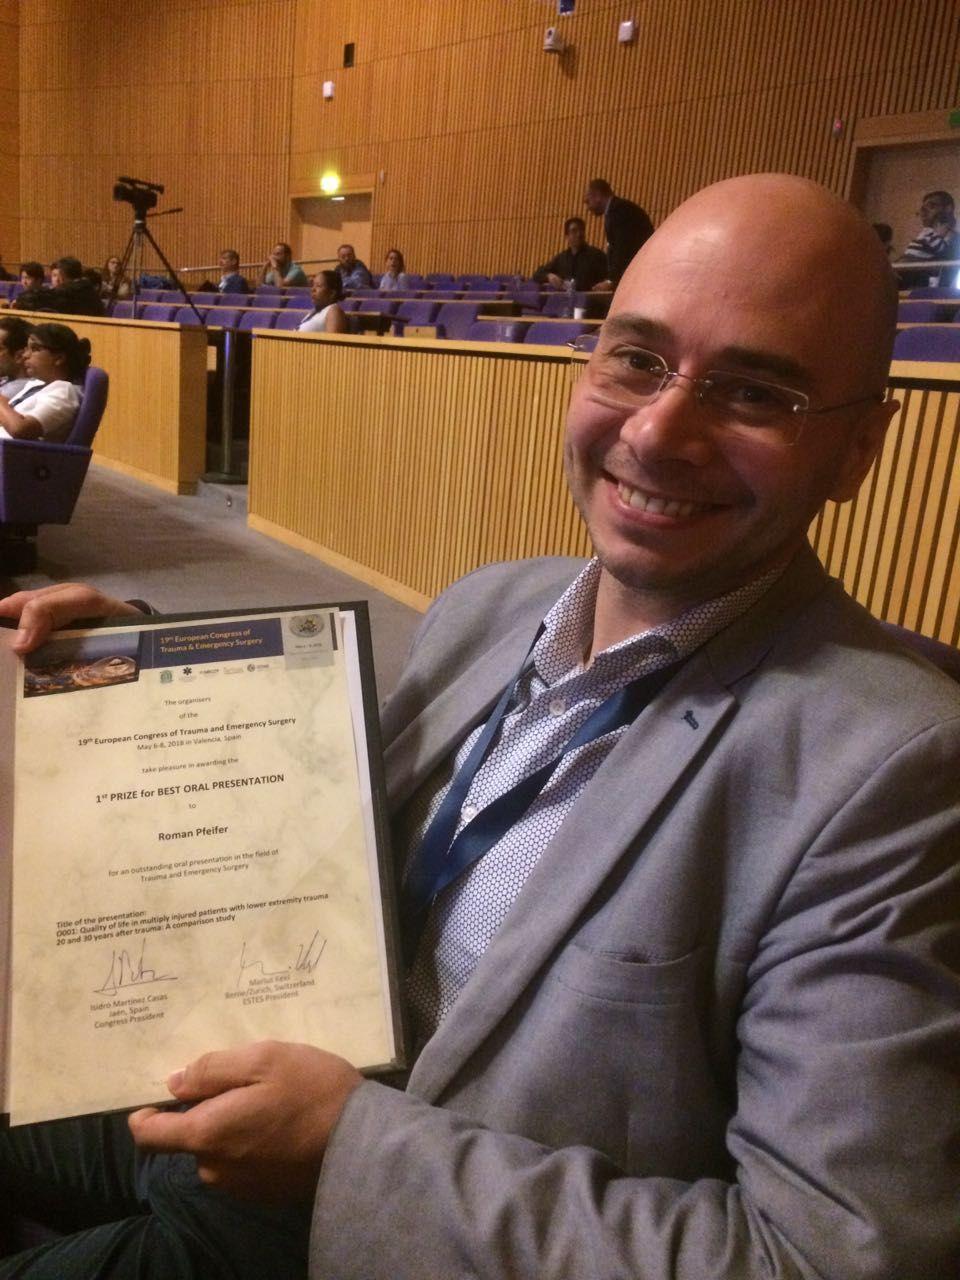 1st Prize Award for BEST ORAL PRESENTATION to PD Roman Pfeifer, M.D.